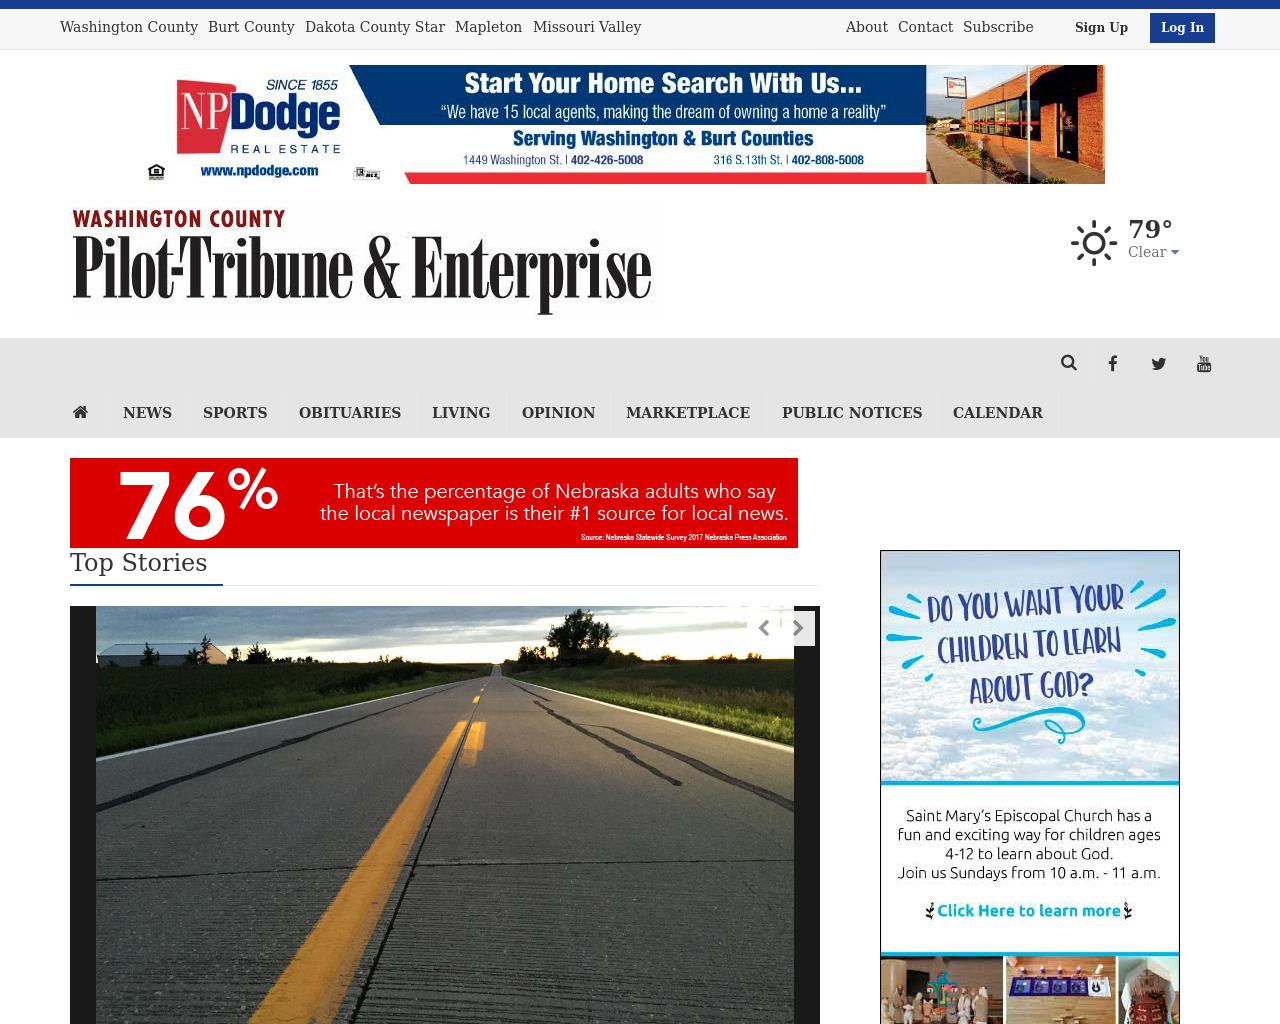 Washington-County-Pilot-Tribune-&-Enterprise-Advertising-Reviews-Pricing